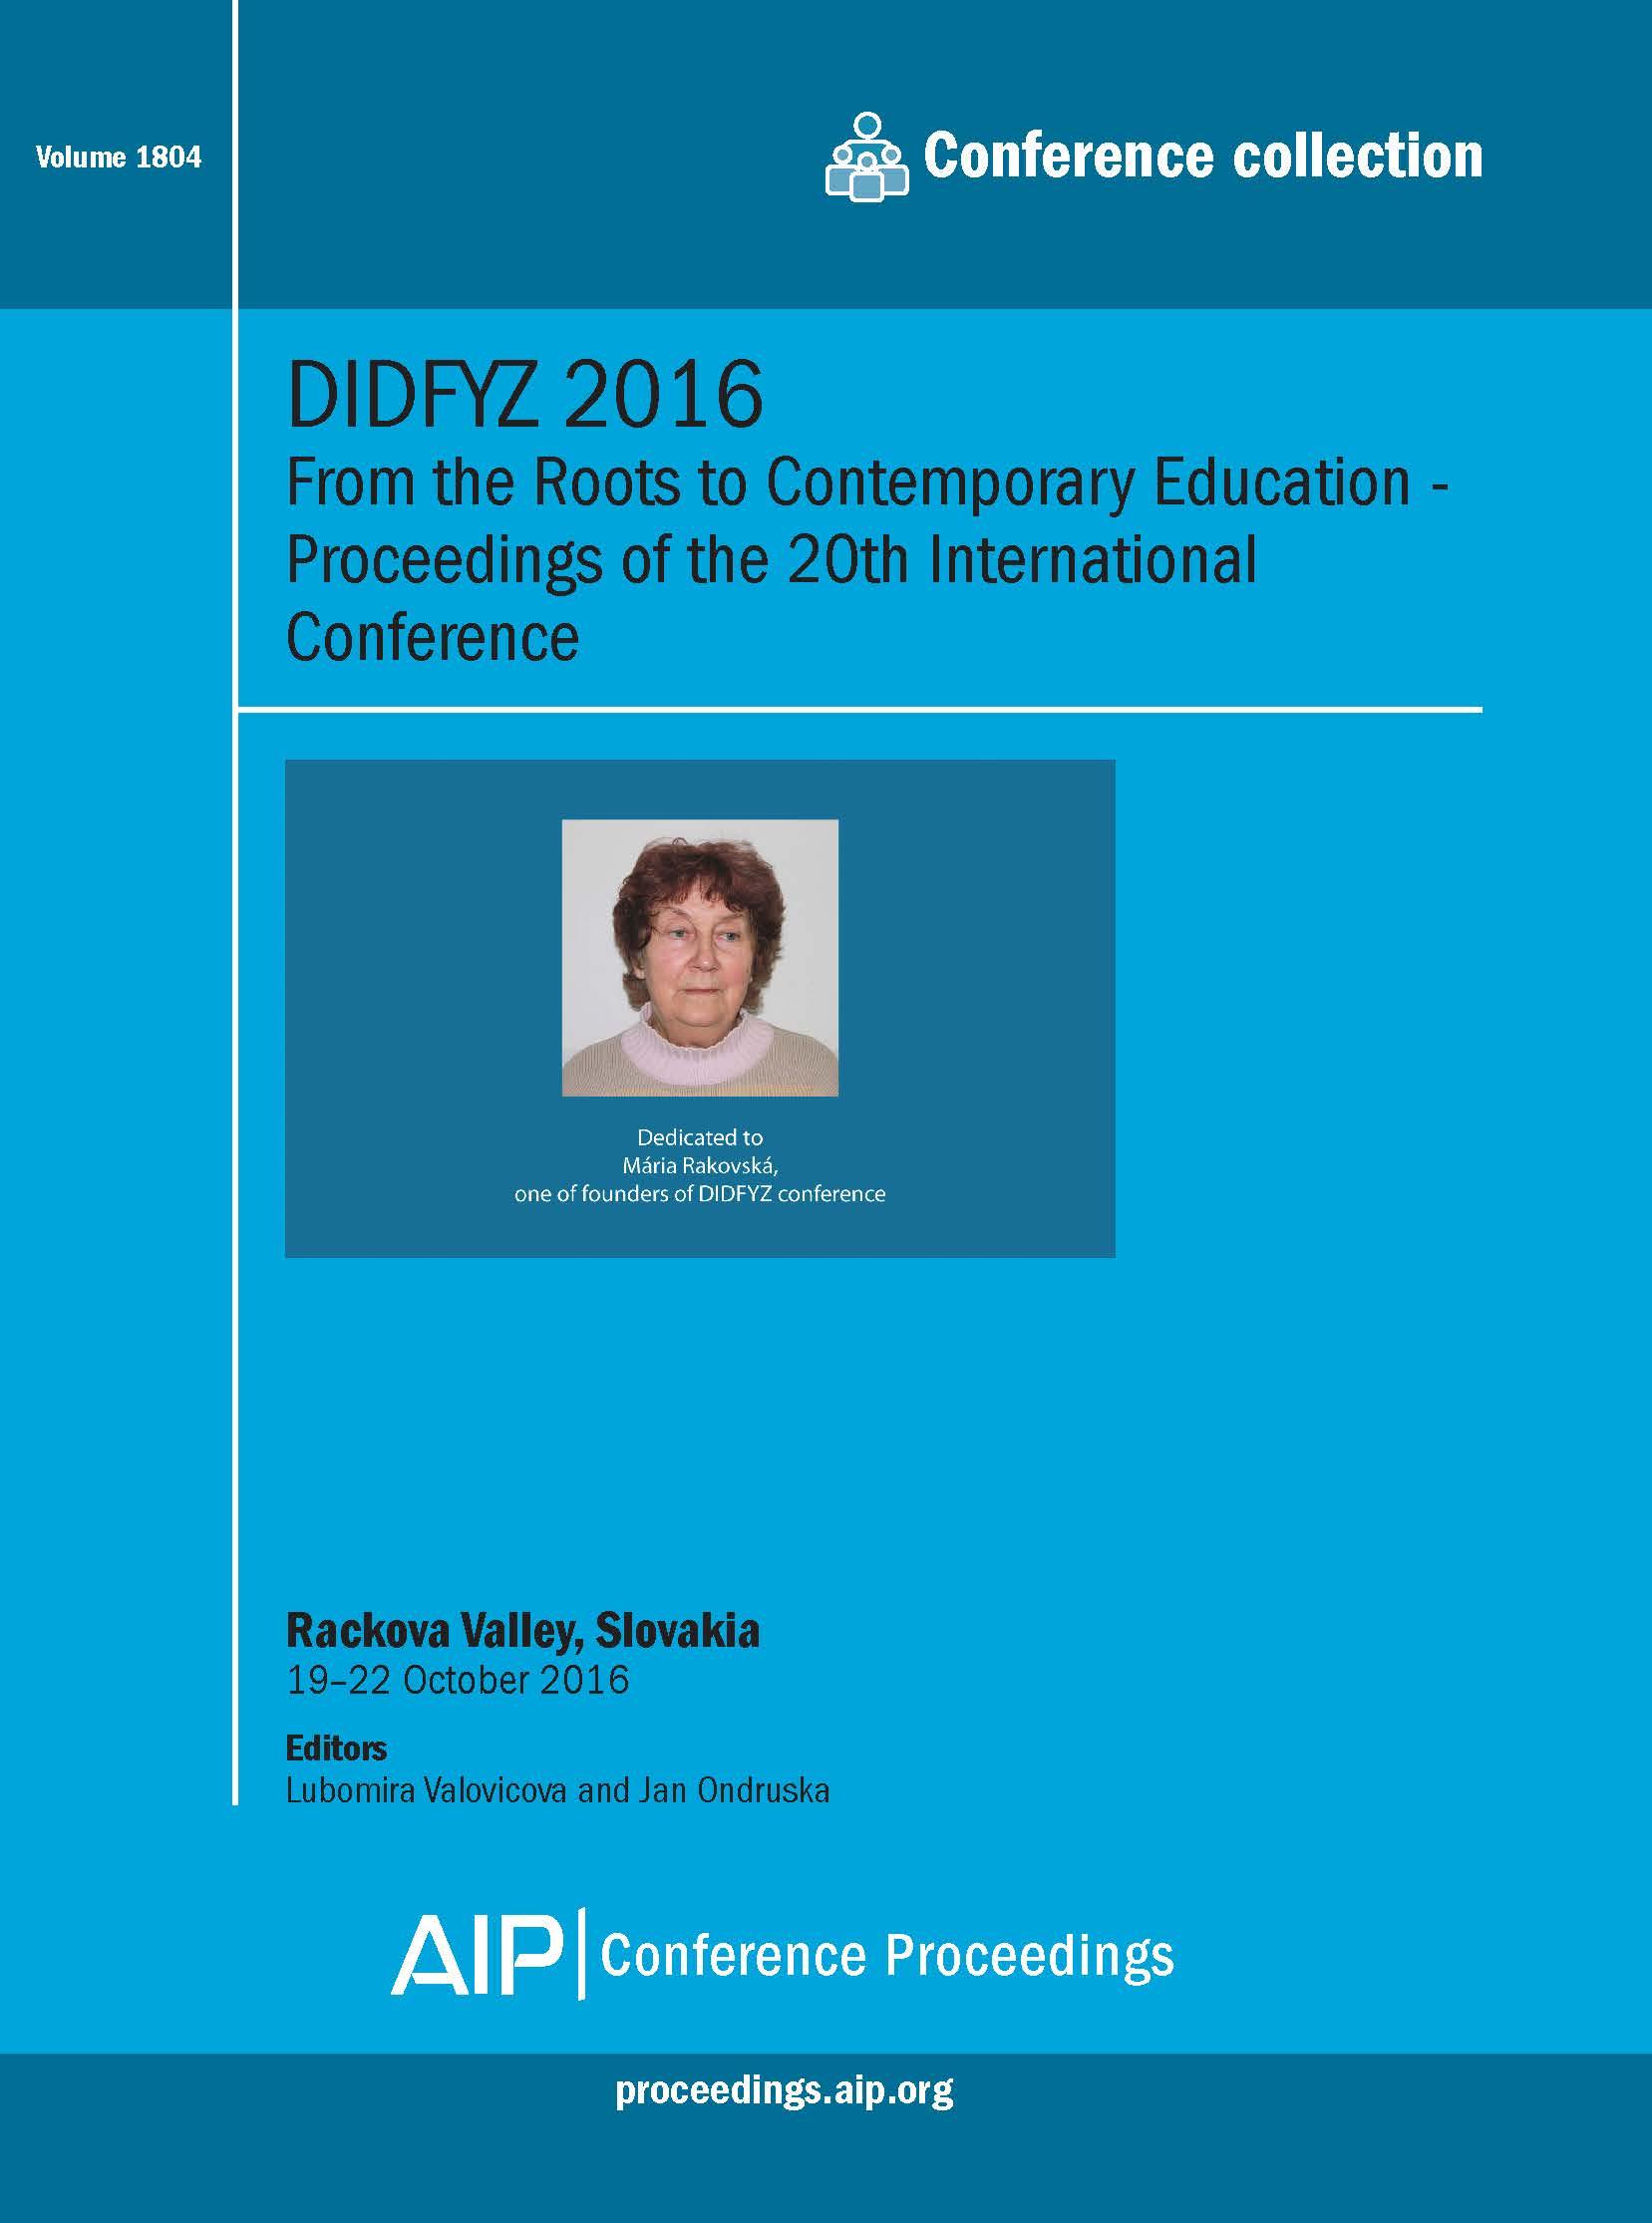 Volume 1804: DIDFYZ 2016 | AIP Publishing Print on Demand